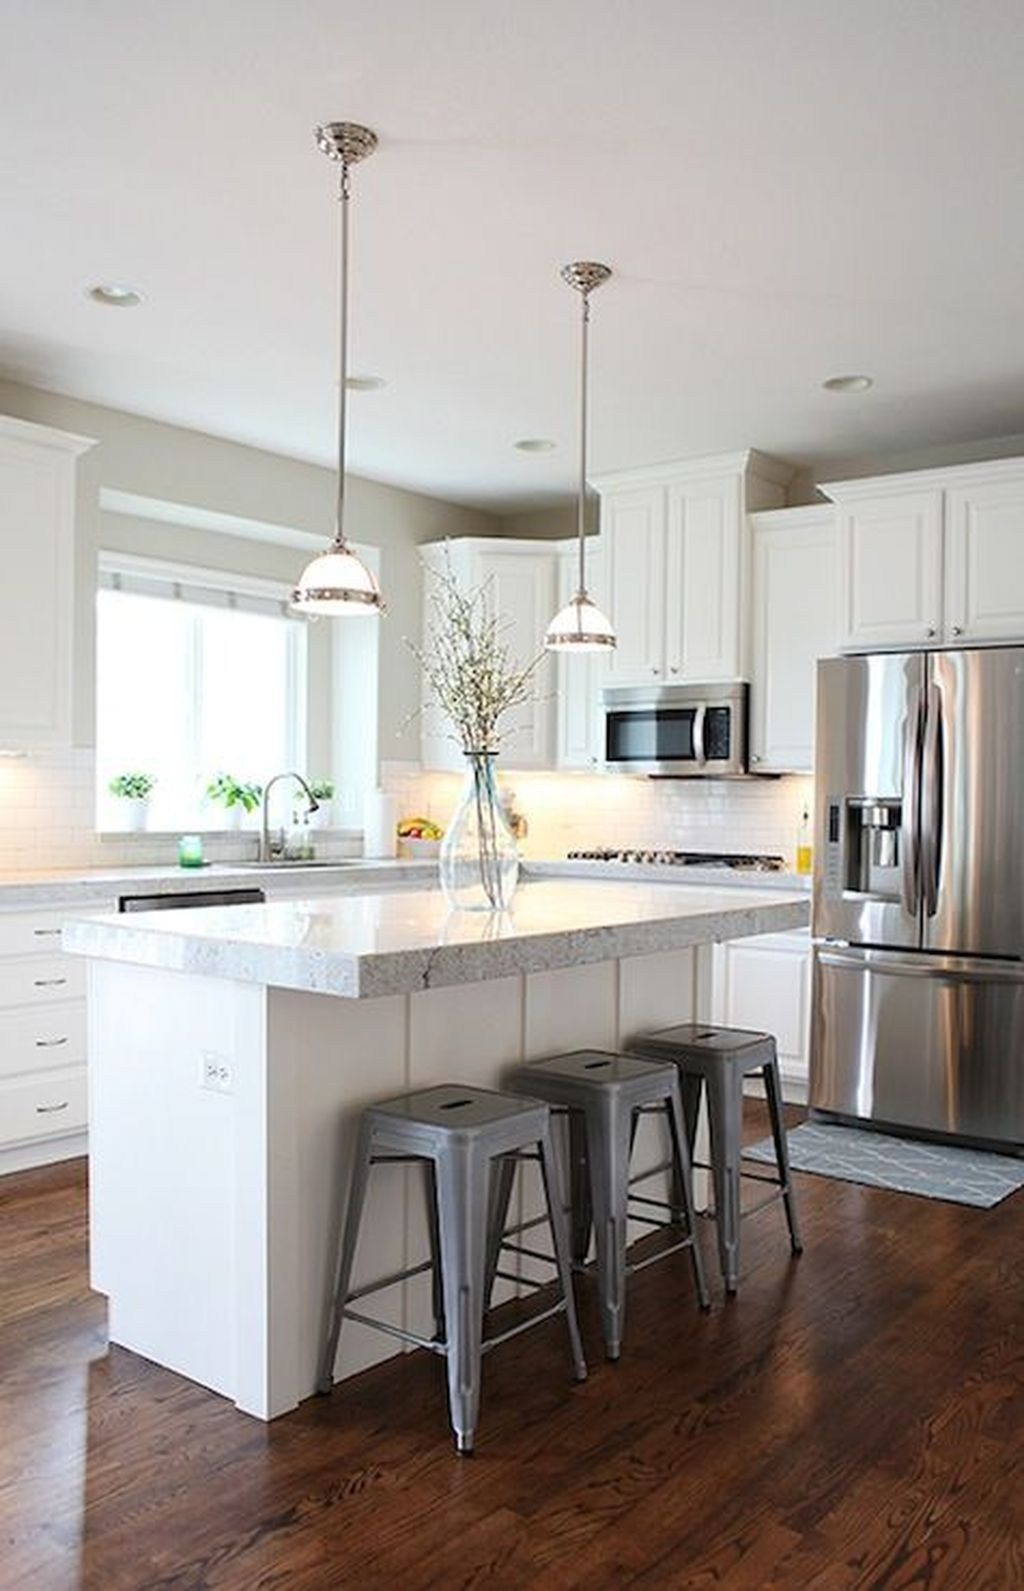 Elegant Small White Kitchen Design Ideas 42 With images ...